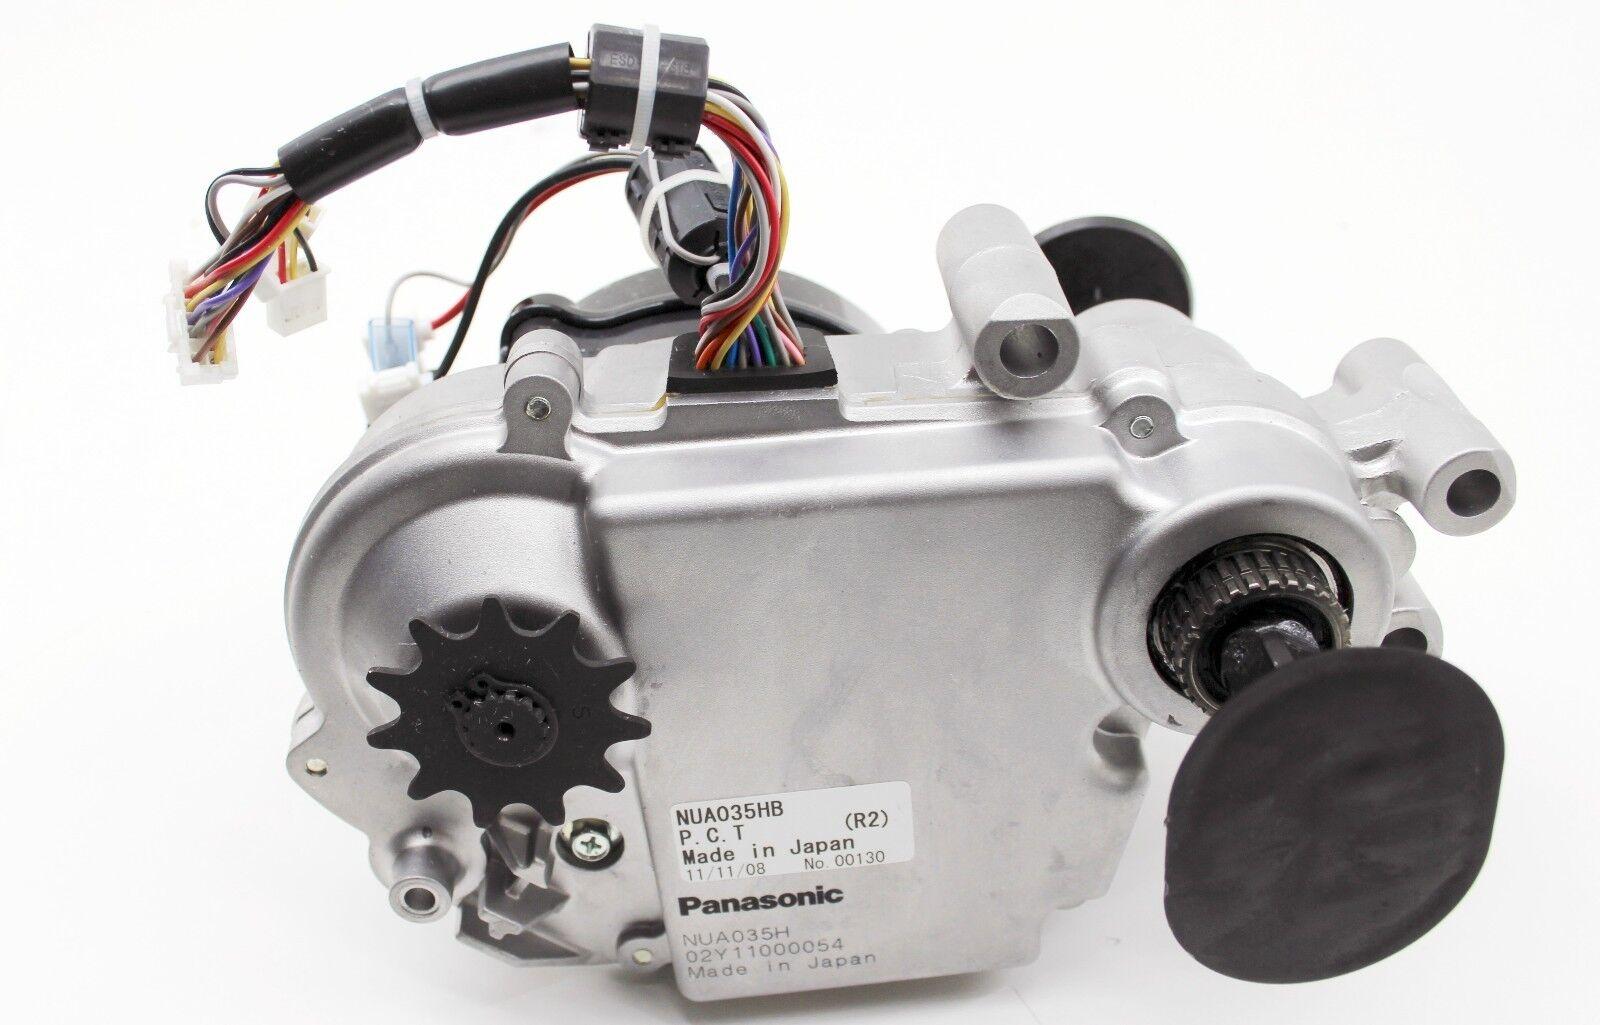 Panasonic Elektro Motor für 45 km h E-Bike  Speed Panasonic NUA035HB, R2  best reputation